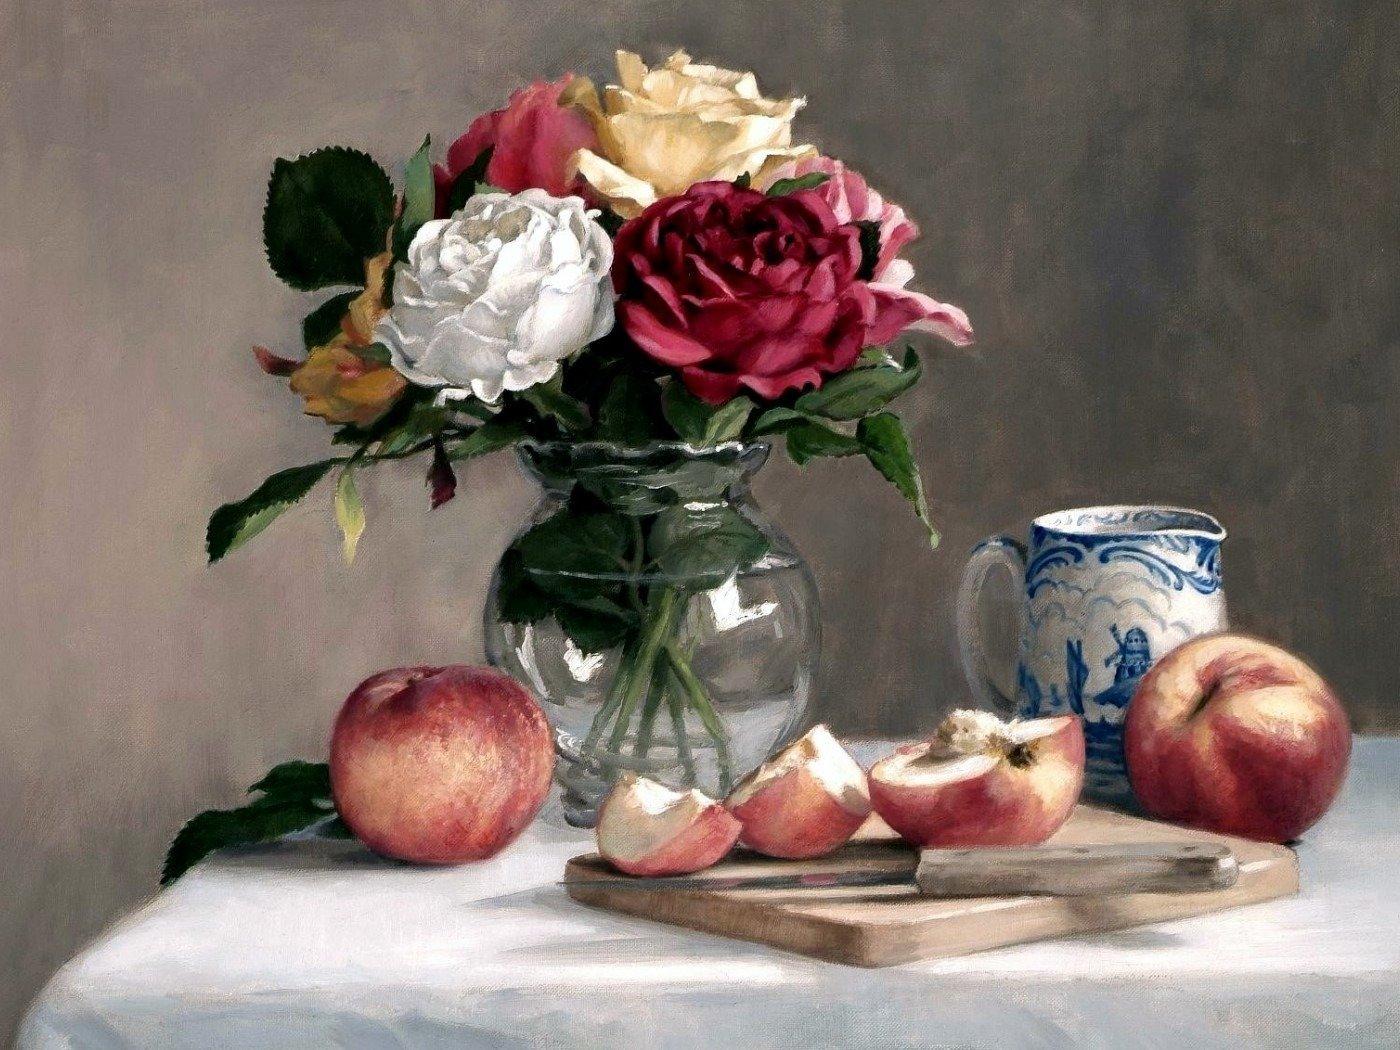 Картинки натюрморты с цветами, куннунэн э5эрдэ